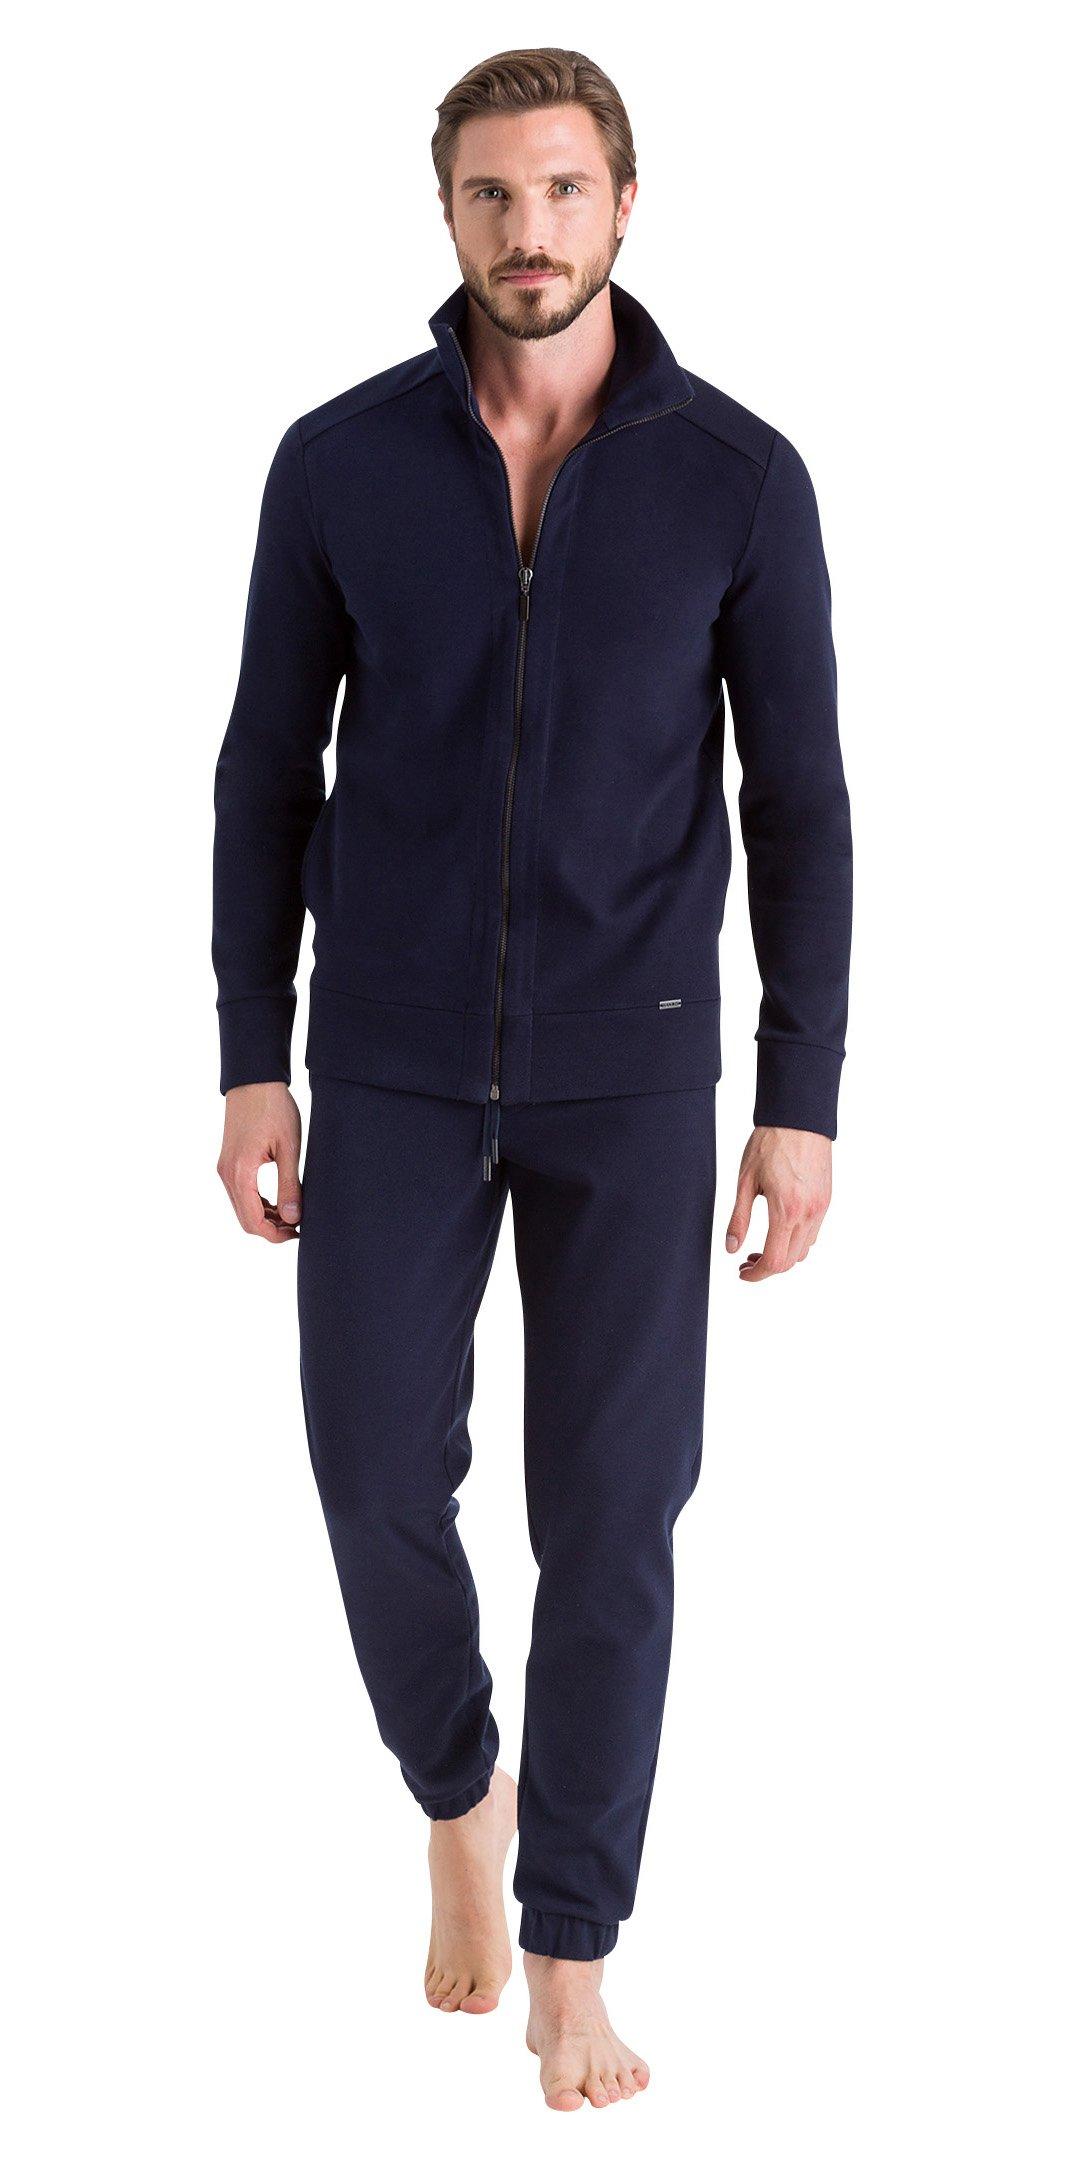 HANRO Men's Benjamin Zip Front Jacket, Doubleface Marine/Ebony, XX-Large by HANRO